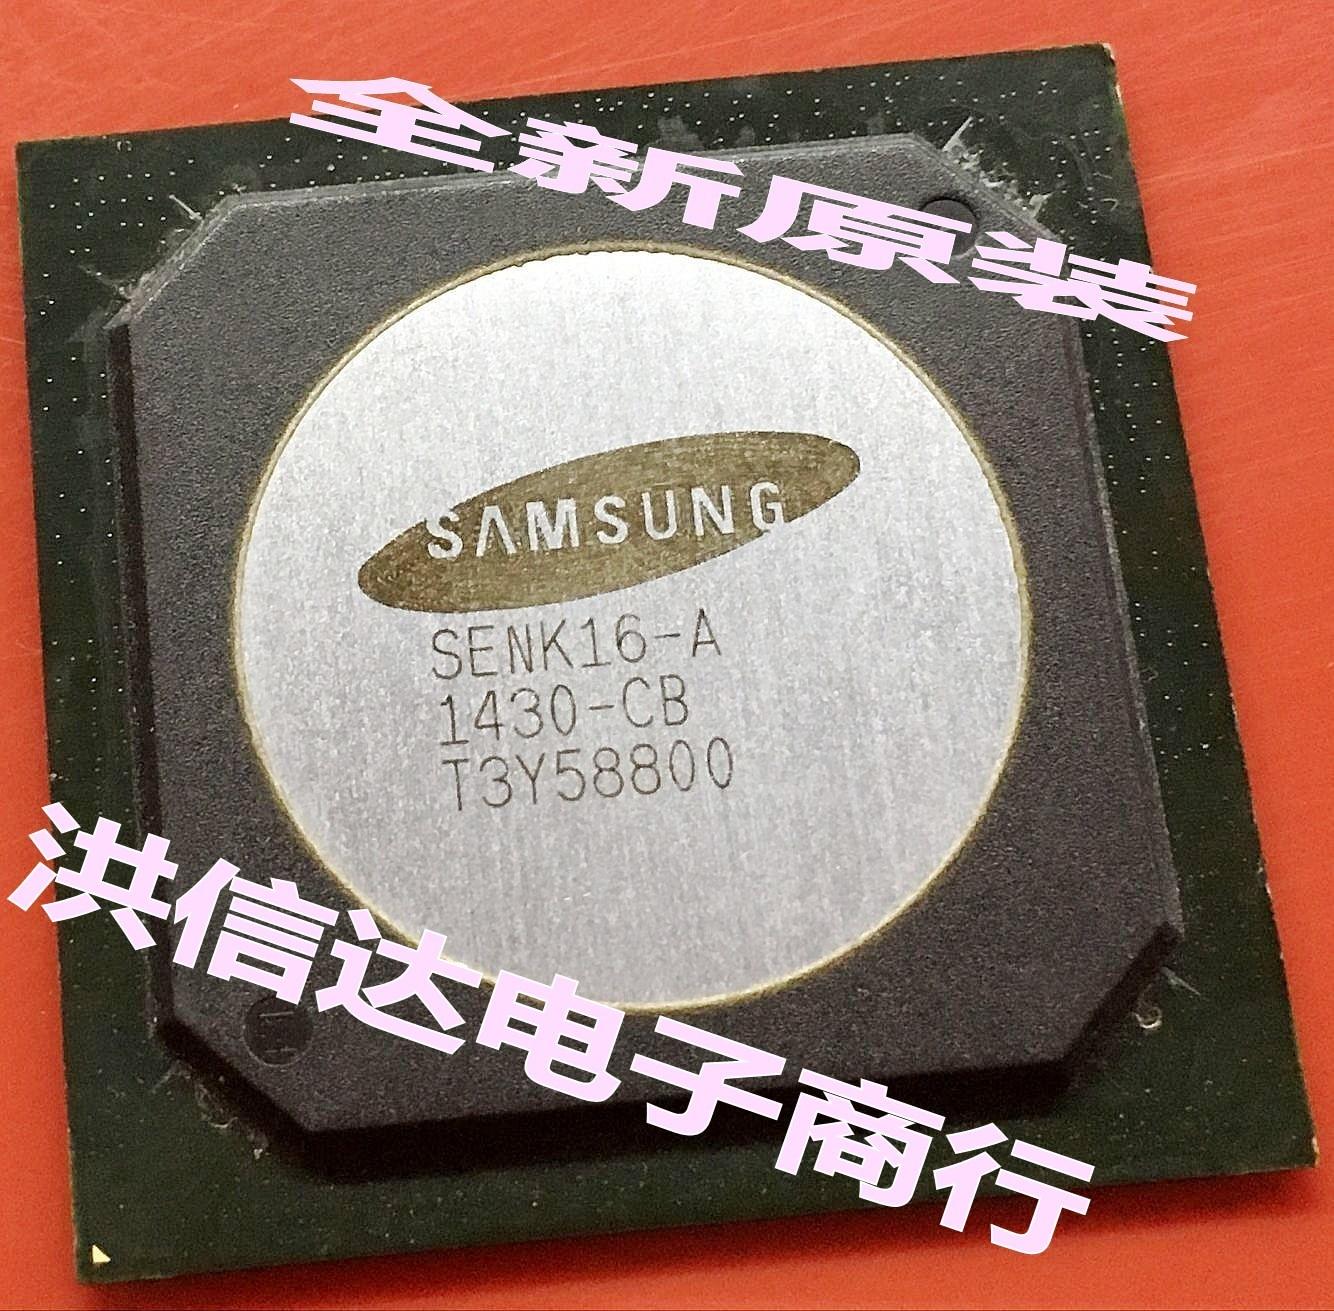 SENK16-A SENK16-A-CB   Original, in stock